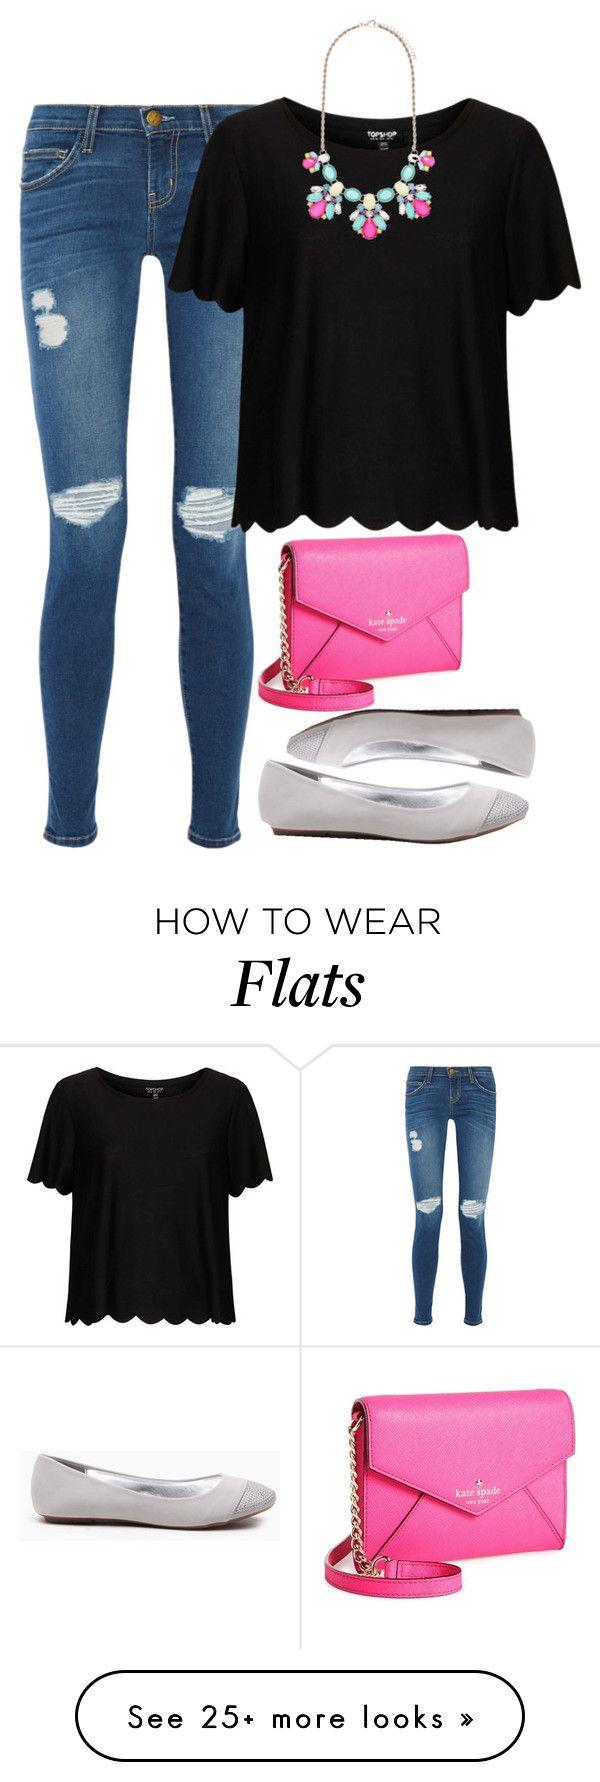 Jean  Blusa negra Camisa negra  Bolso neón  Bolso rosado  Baletas plateadas